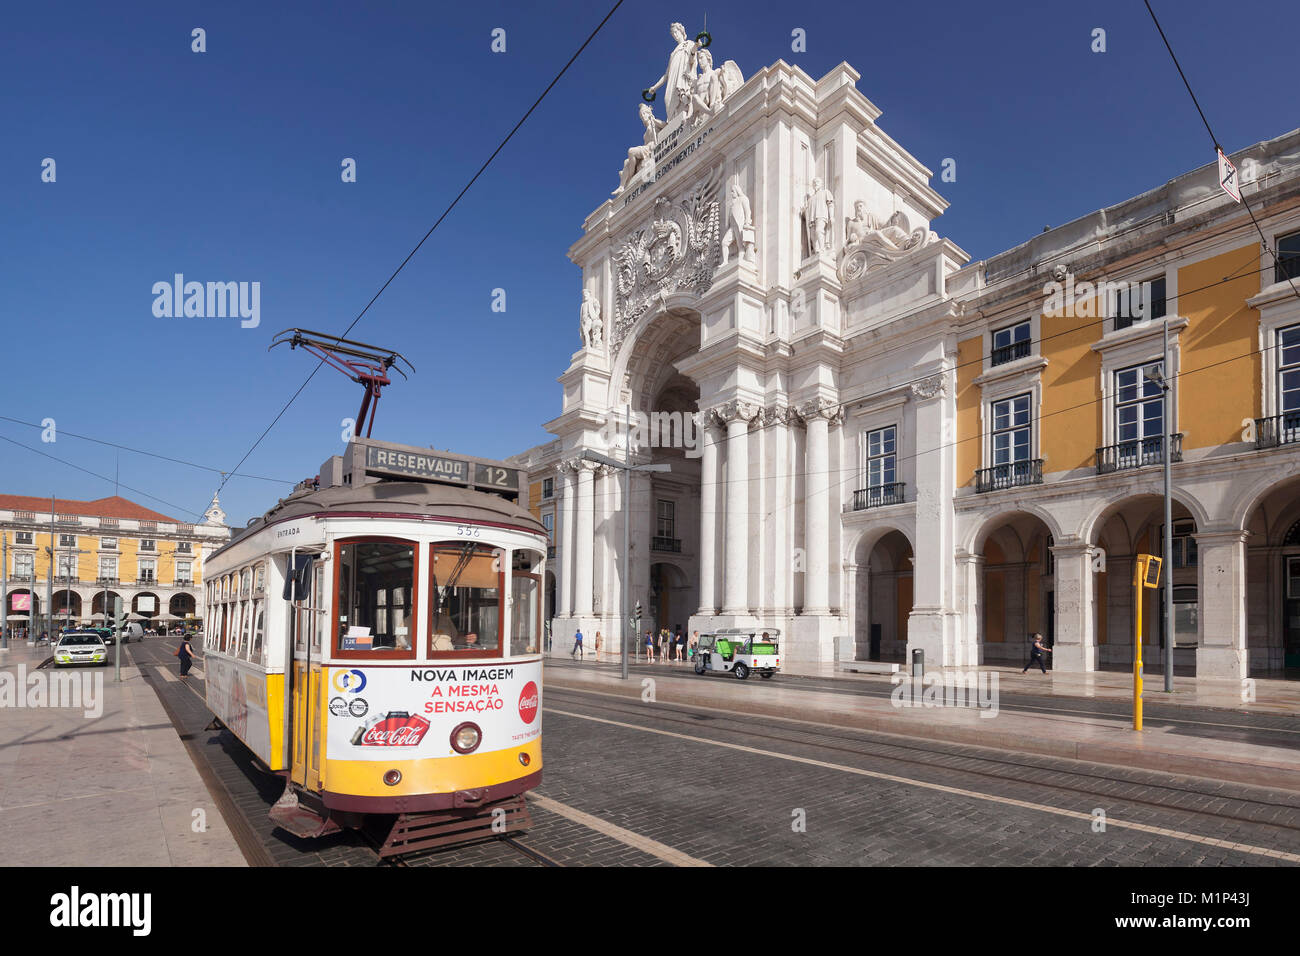 Tram, Arco da Rua Augusta triumphal arch, Praca do Comercio, Baixa, Lisbon, Portugal, Europe - Stock Image